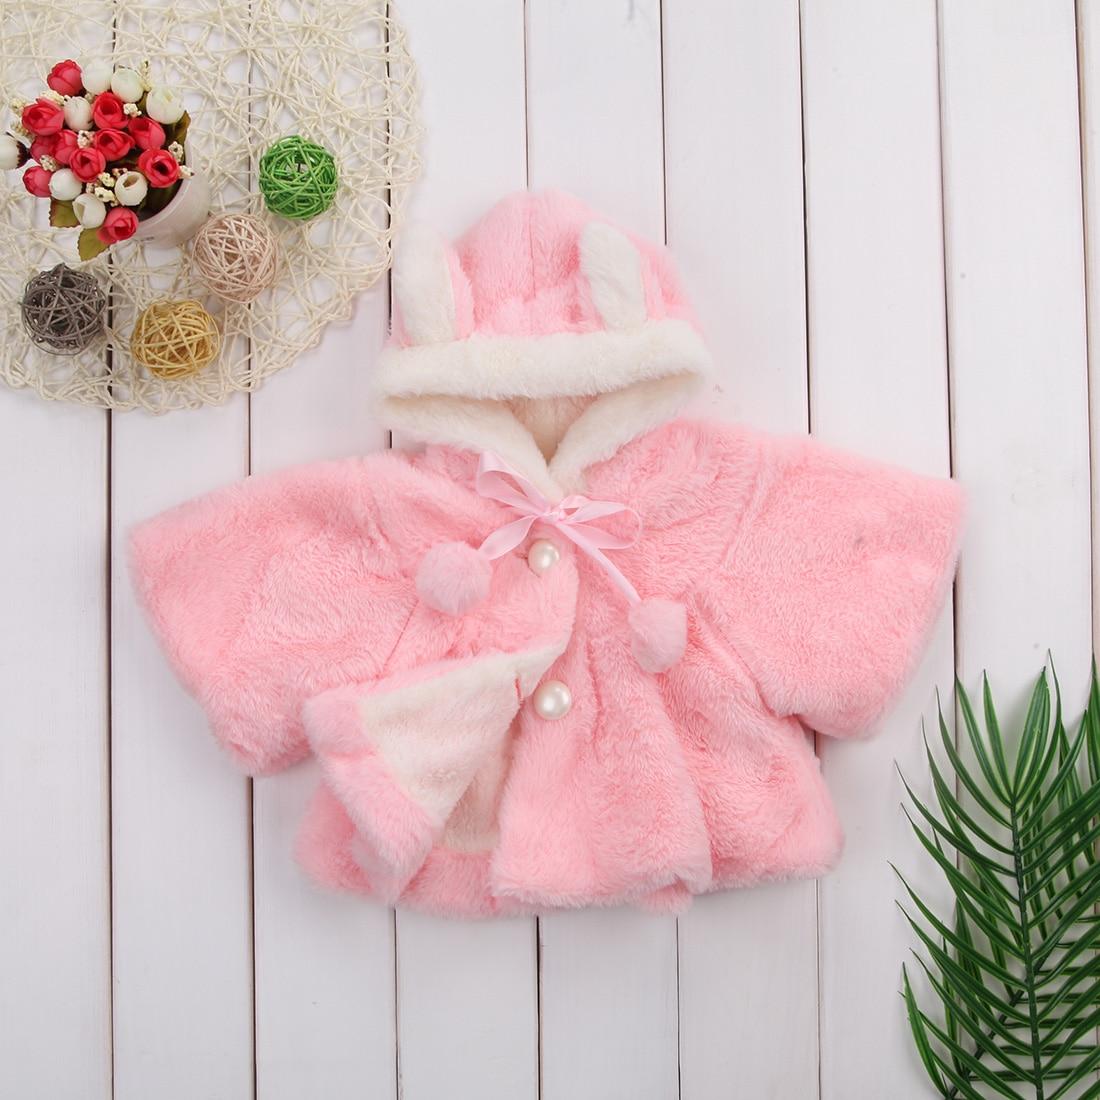 11d22ee9f Cute Baby Toddler Girl Clothes Warm Fleece Winter 3D Ear Coat ...